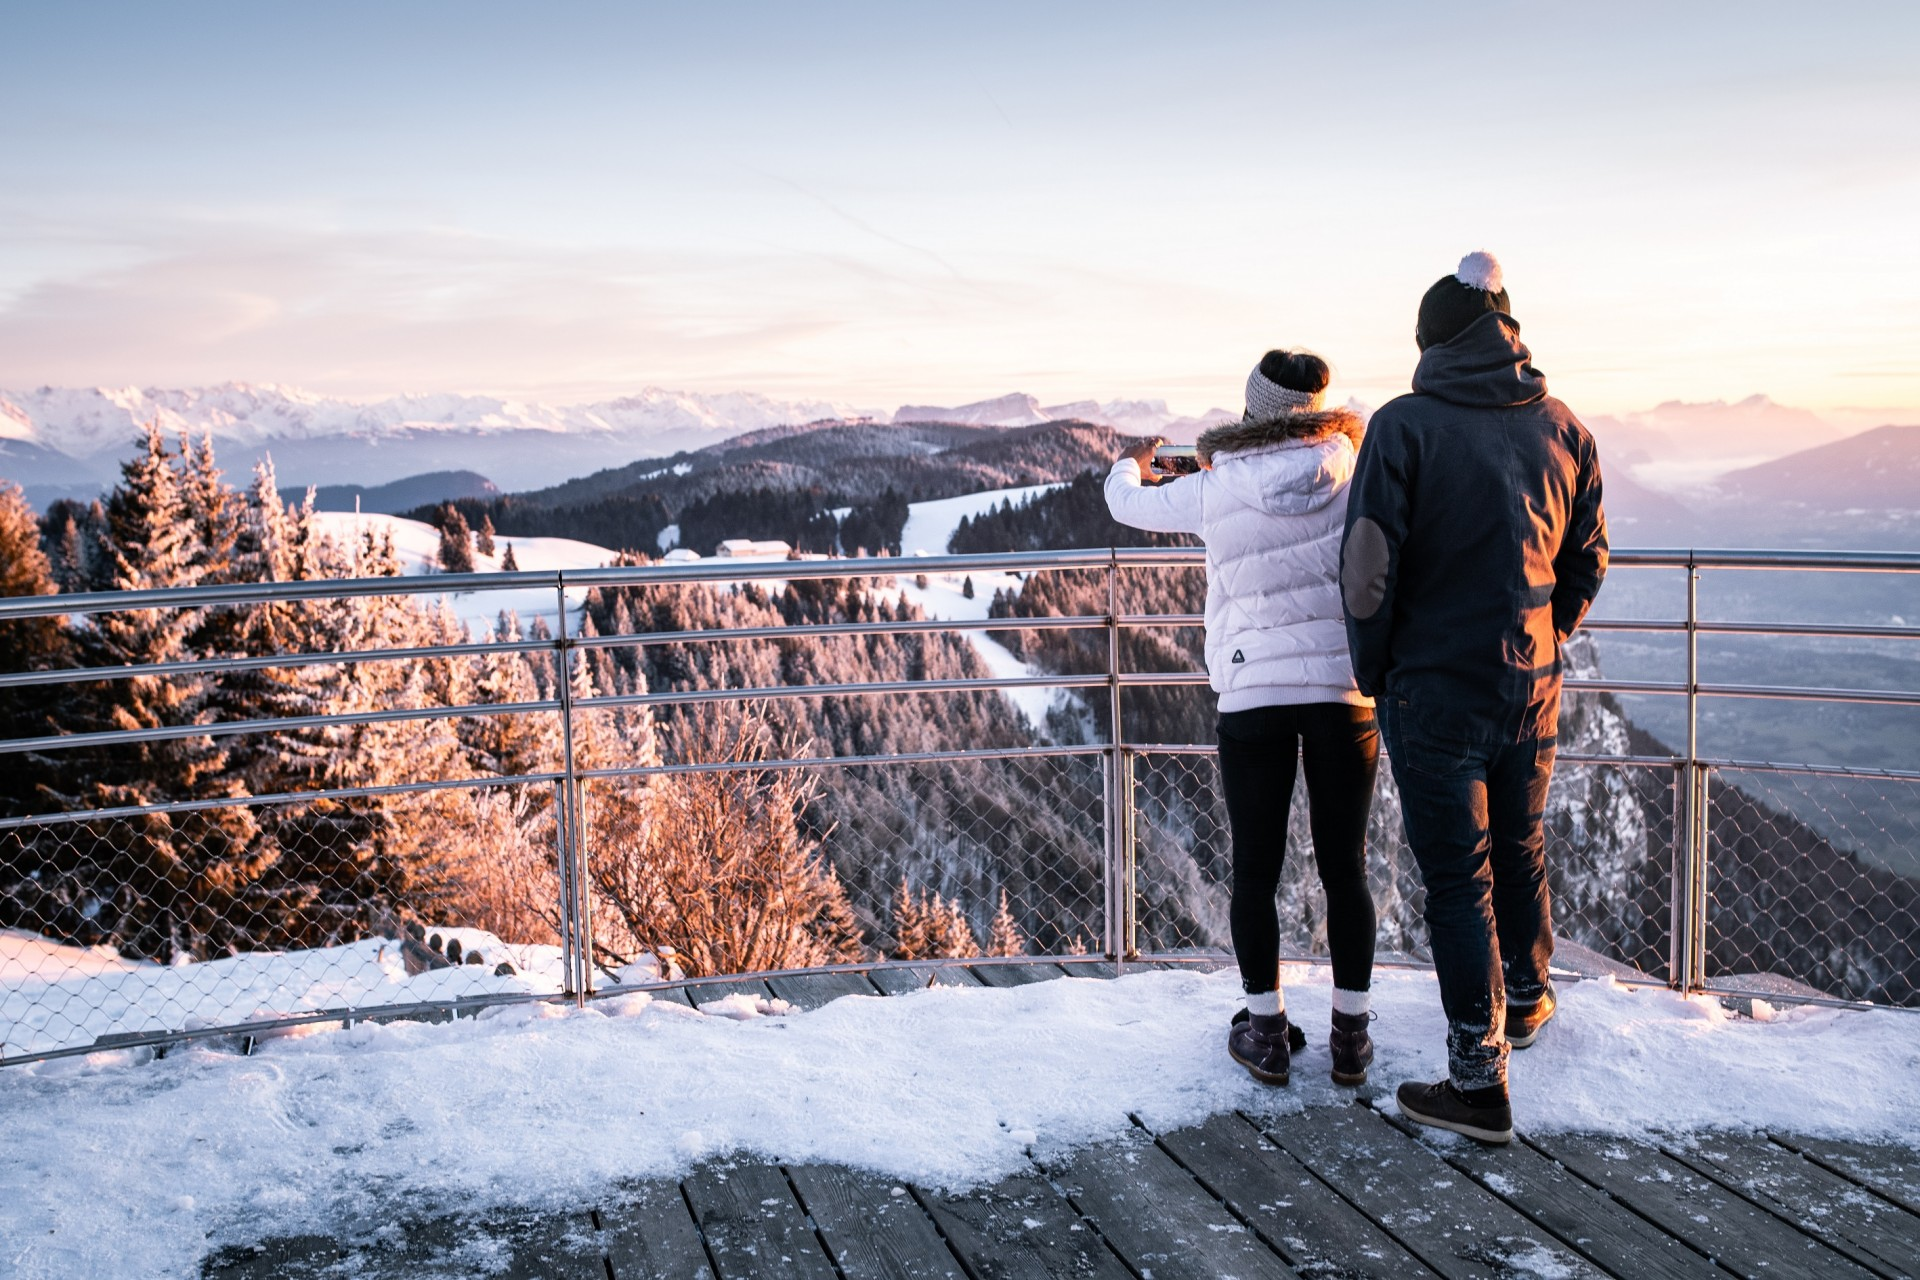 savoie-grand-revard-hiver-2019-peignee-verticale-438